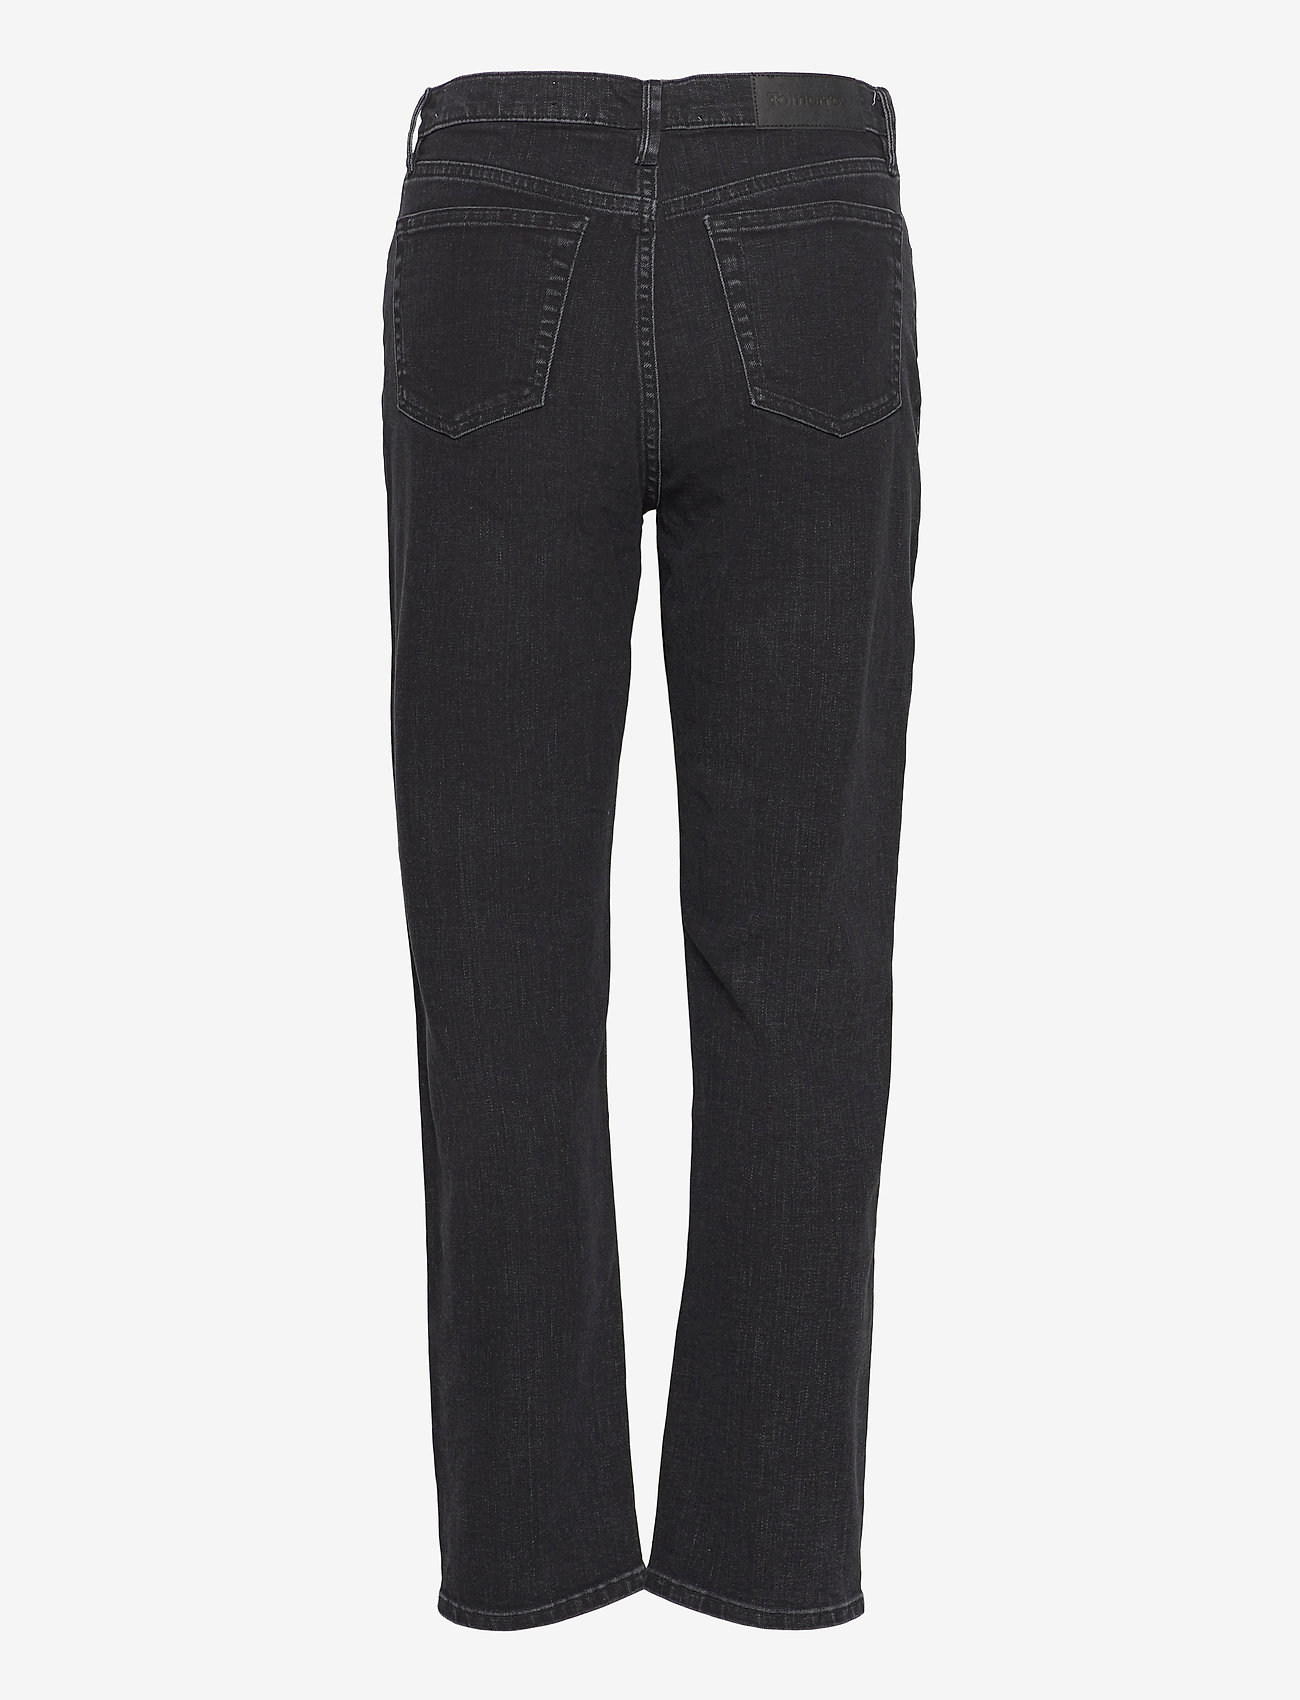 Tomorrow - Teresa regular jeans original black - straight regular - black - 1